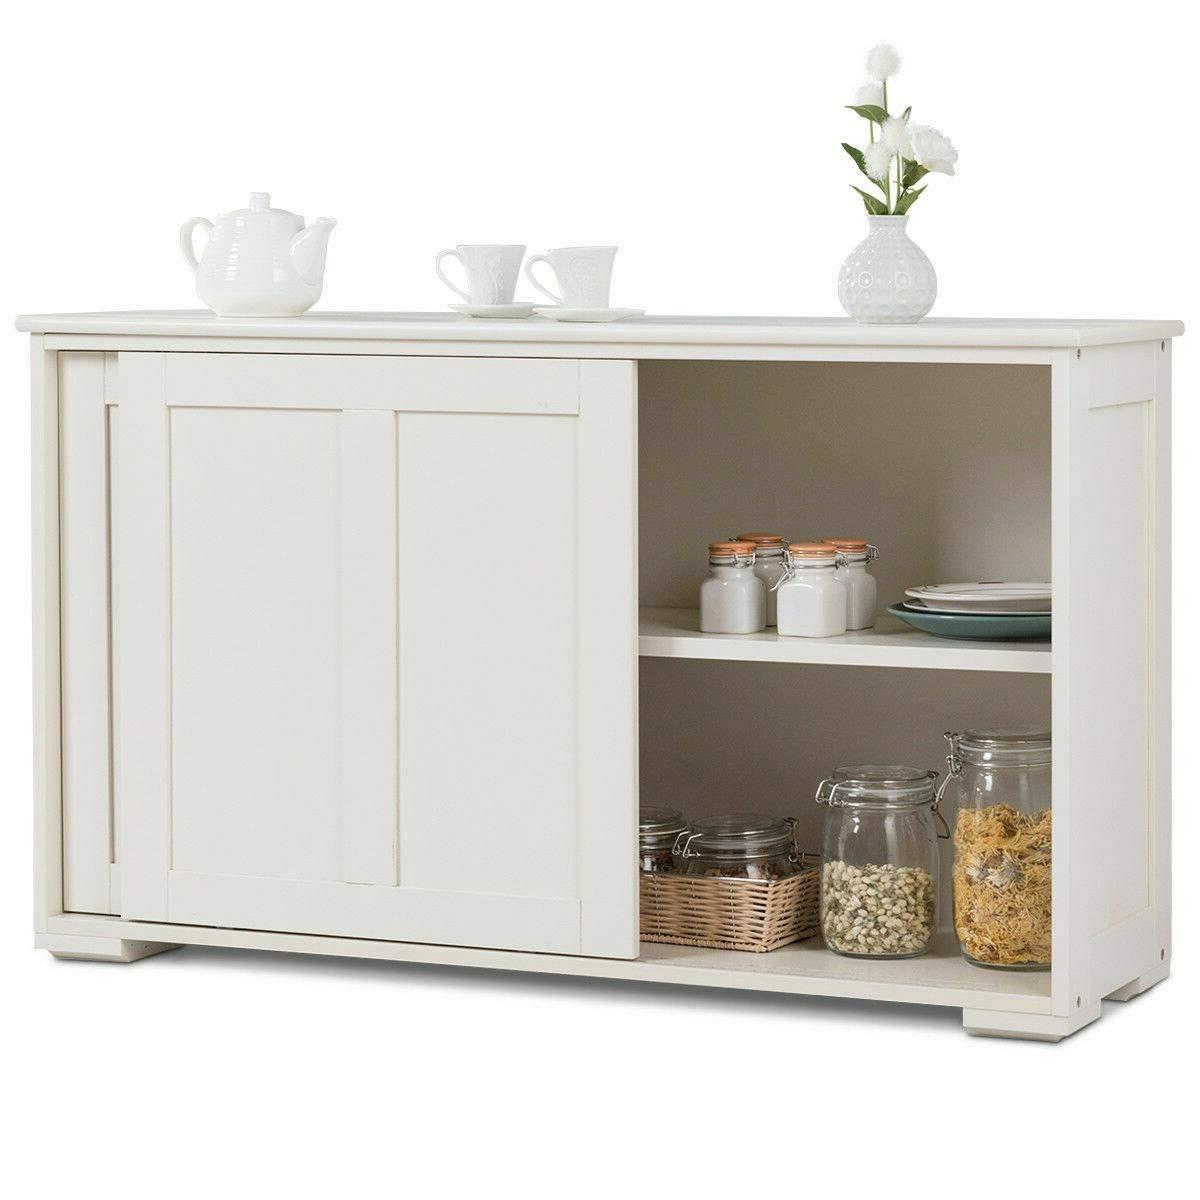 Amazon.com - Havilah7 Cabinet Storage Cupboard Sideboard ...